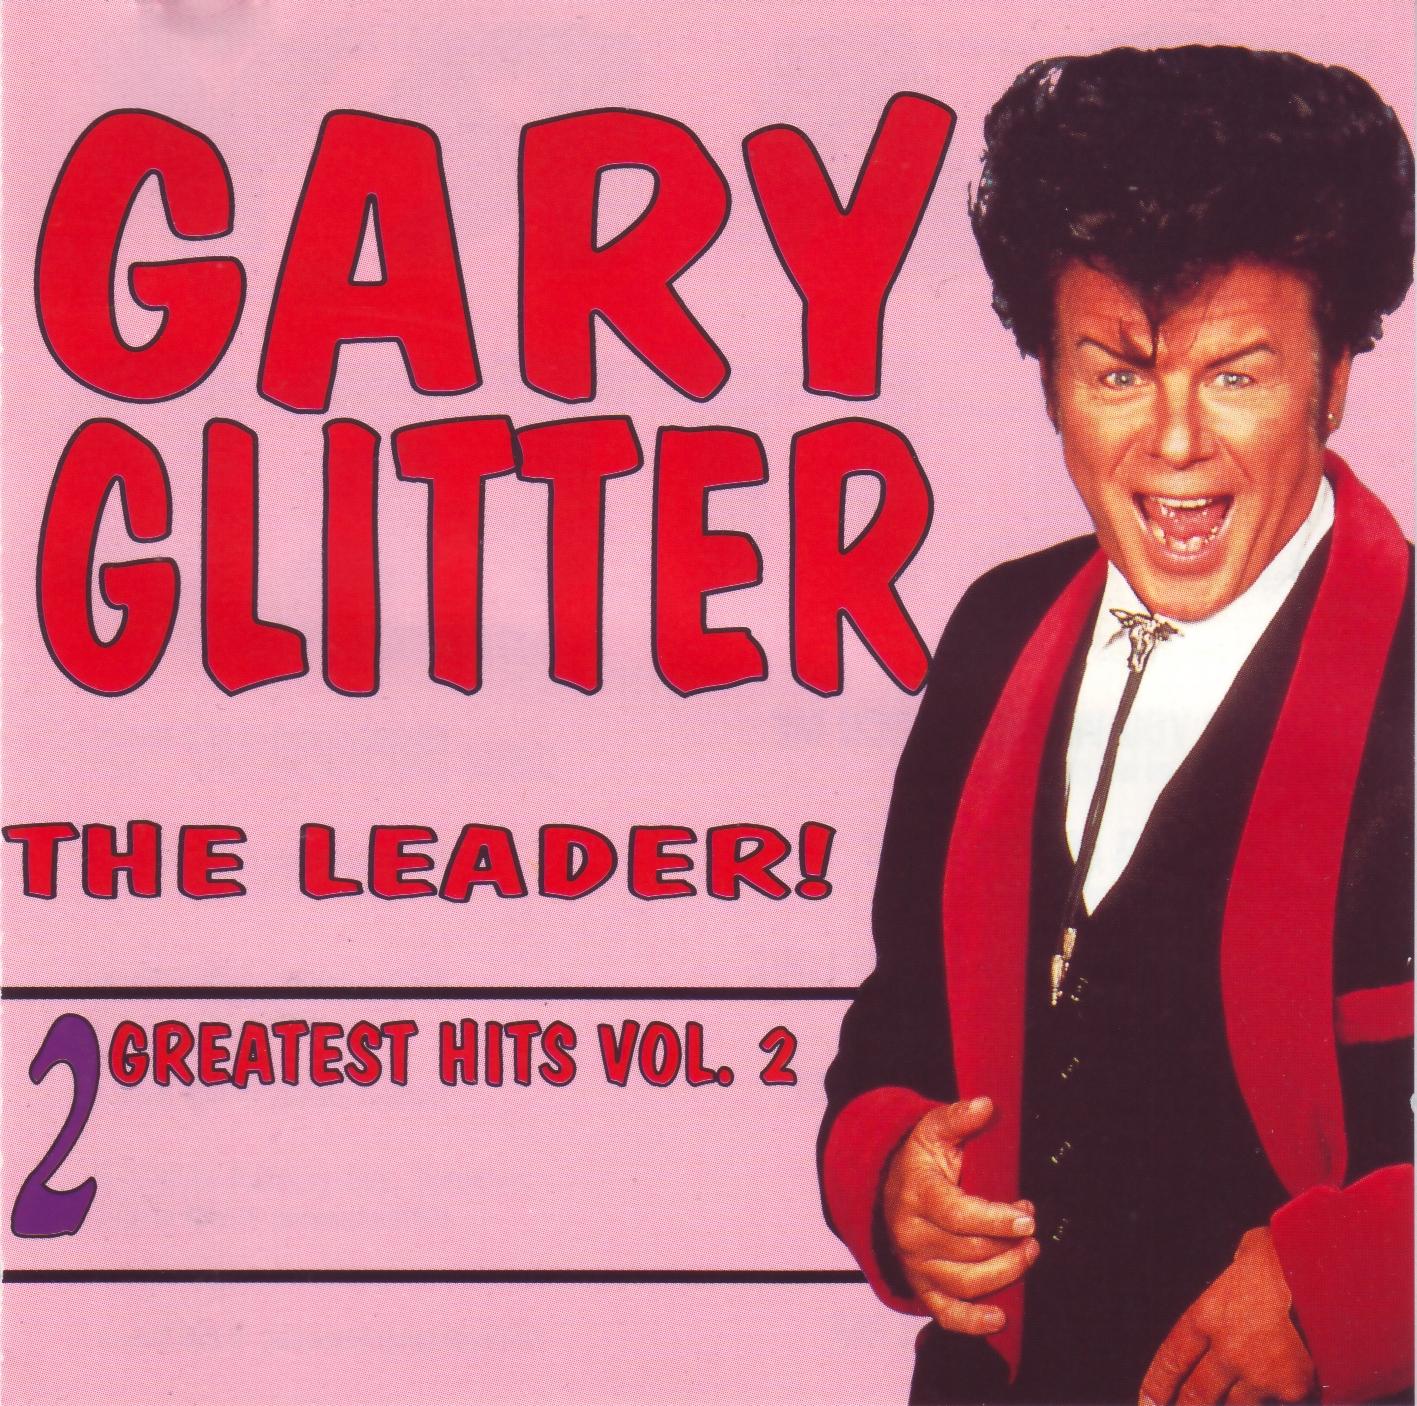 http://4.bp.blogspot.com/_M3kh5U9nIM0/TKbJ6cE33HI/AAAAAAAAGZM/6pKcjfENd6g/s1600/Gary_Glitter_volume_2_front.jpg